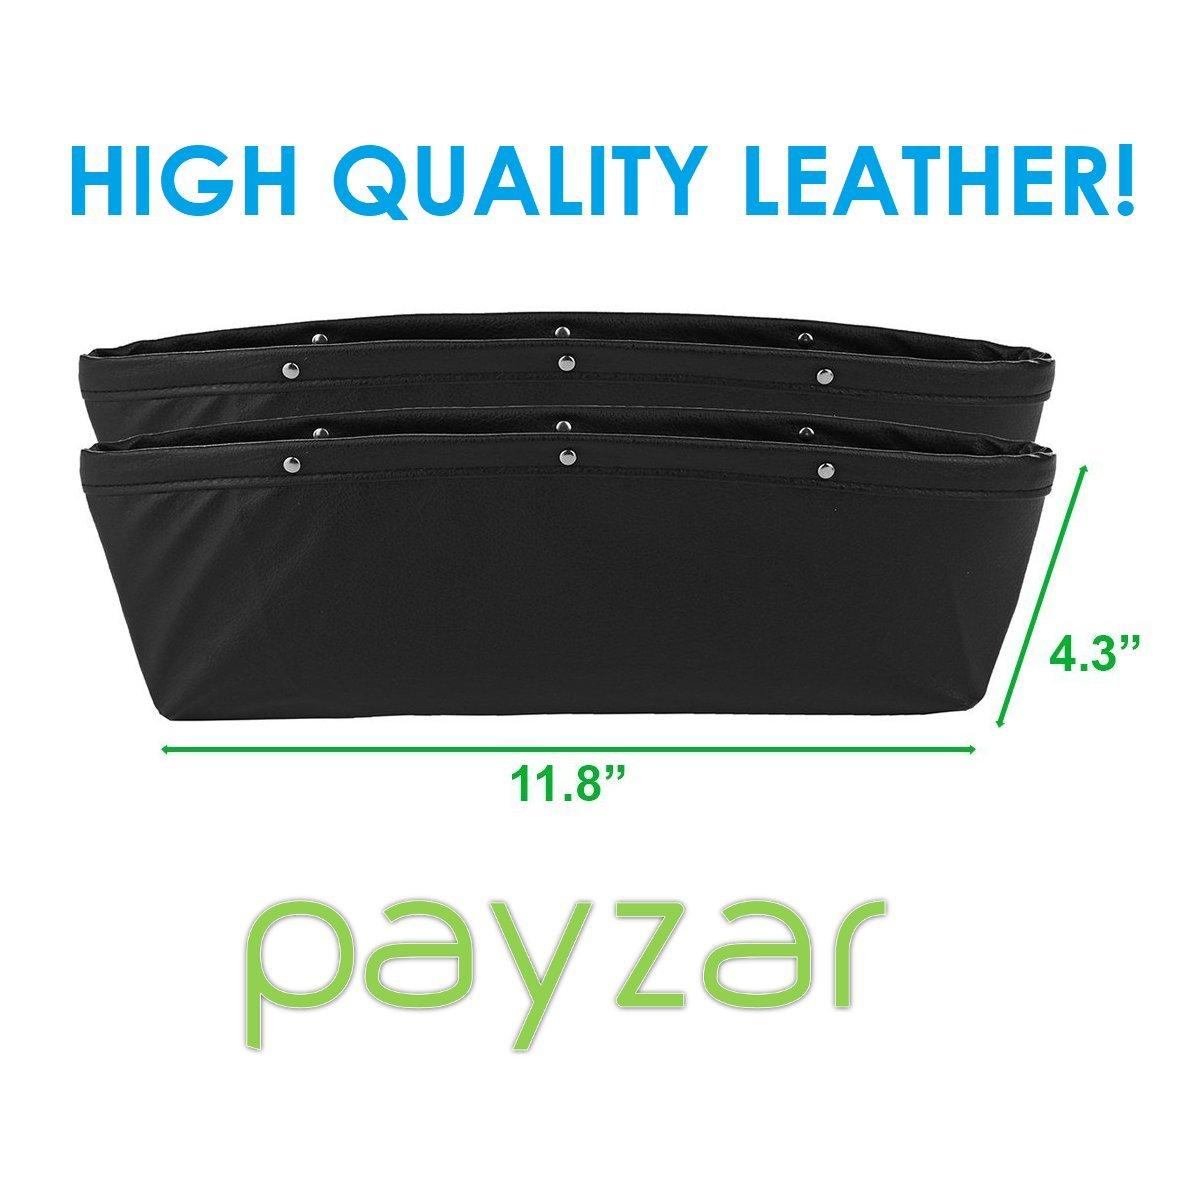 Car Interior Accessories Premium PU Full Leather Seat Console Organizer Car Seat Side Drop Caddy Catcher 5559021794 2 Pack Car Seat Gap Filler By Payzar Car Pocket Organizer